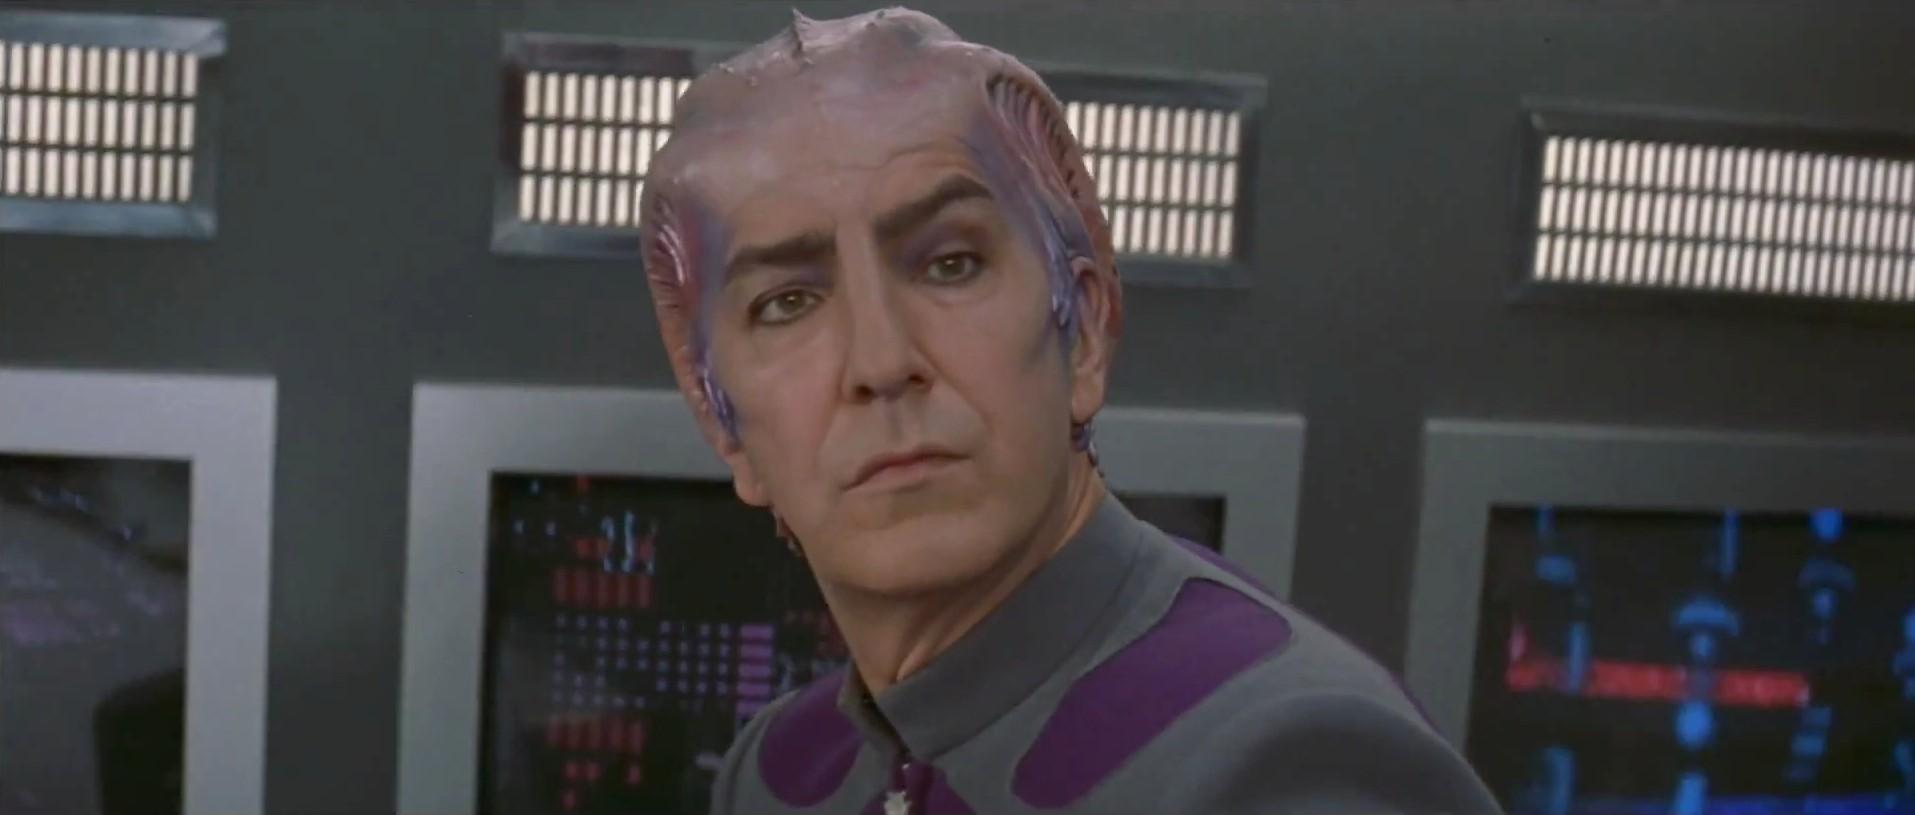 alan-rickman-as-alexander-dane-in-galaxy